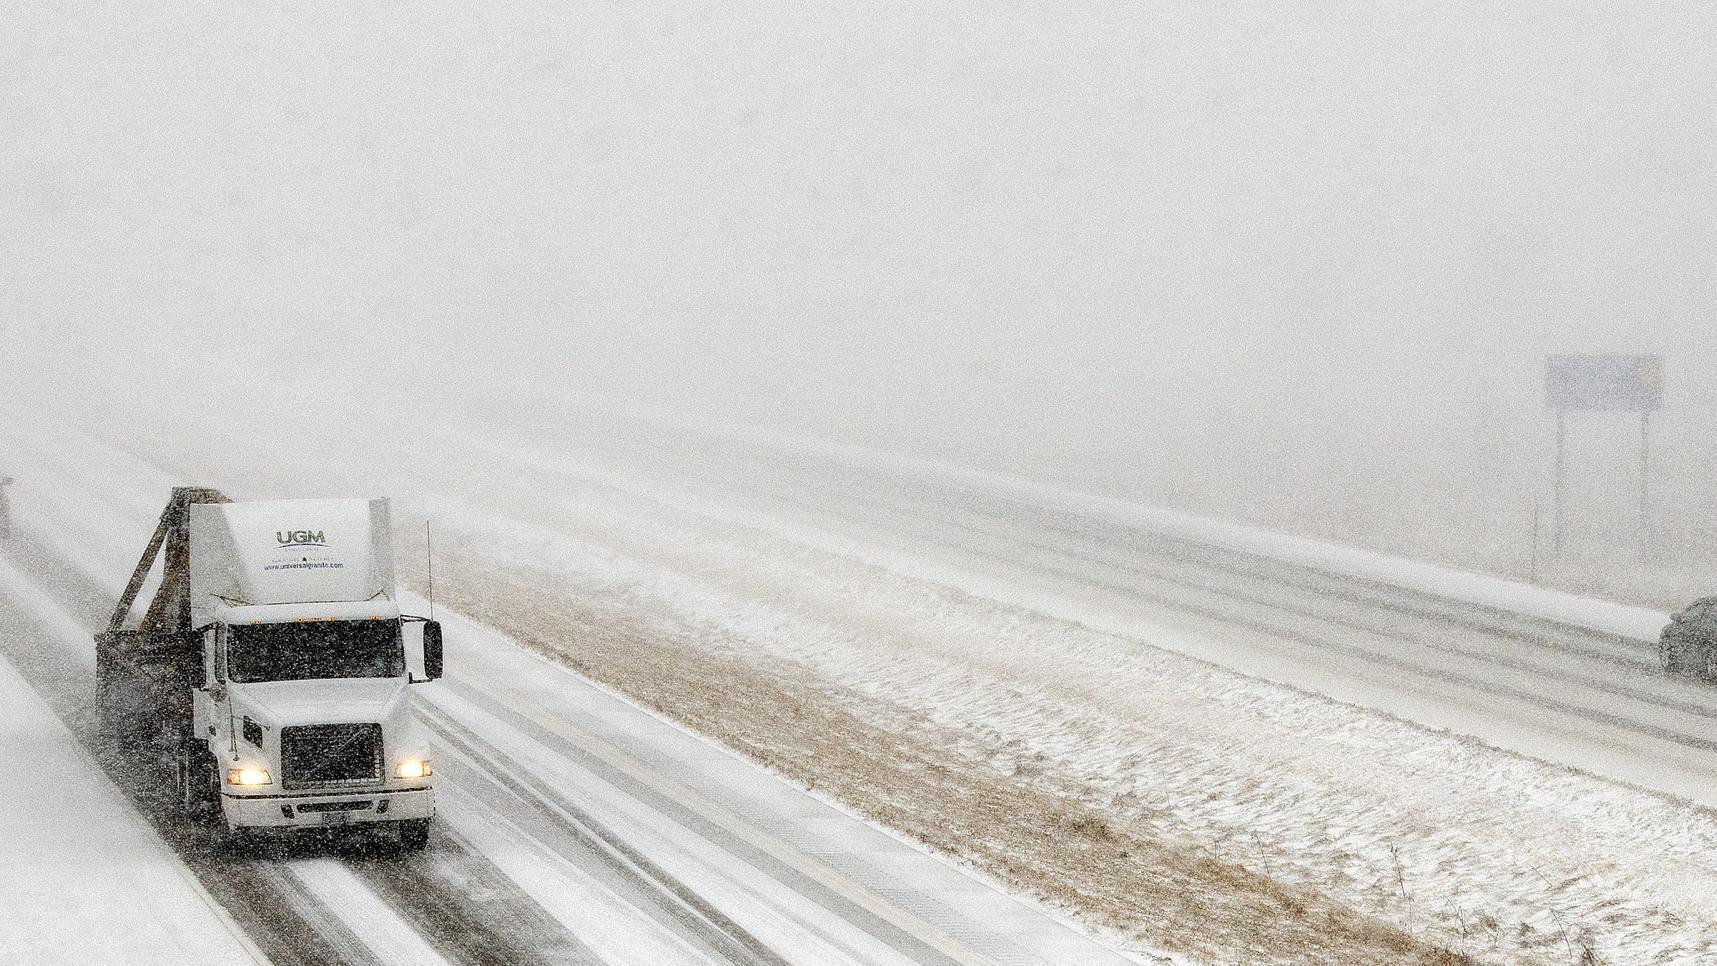 Winter storm makes travel treacherous, causes interstate closure